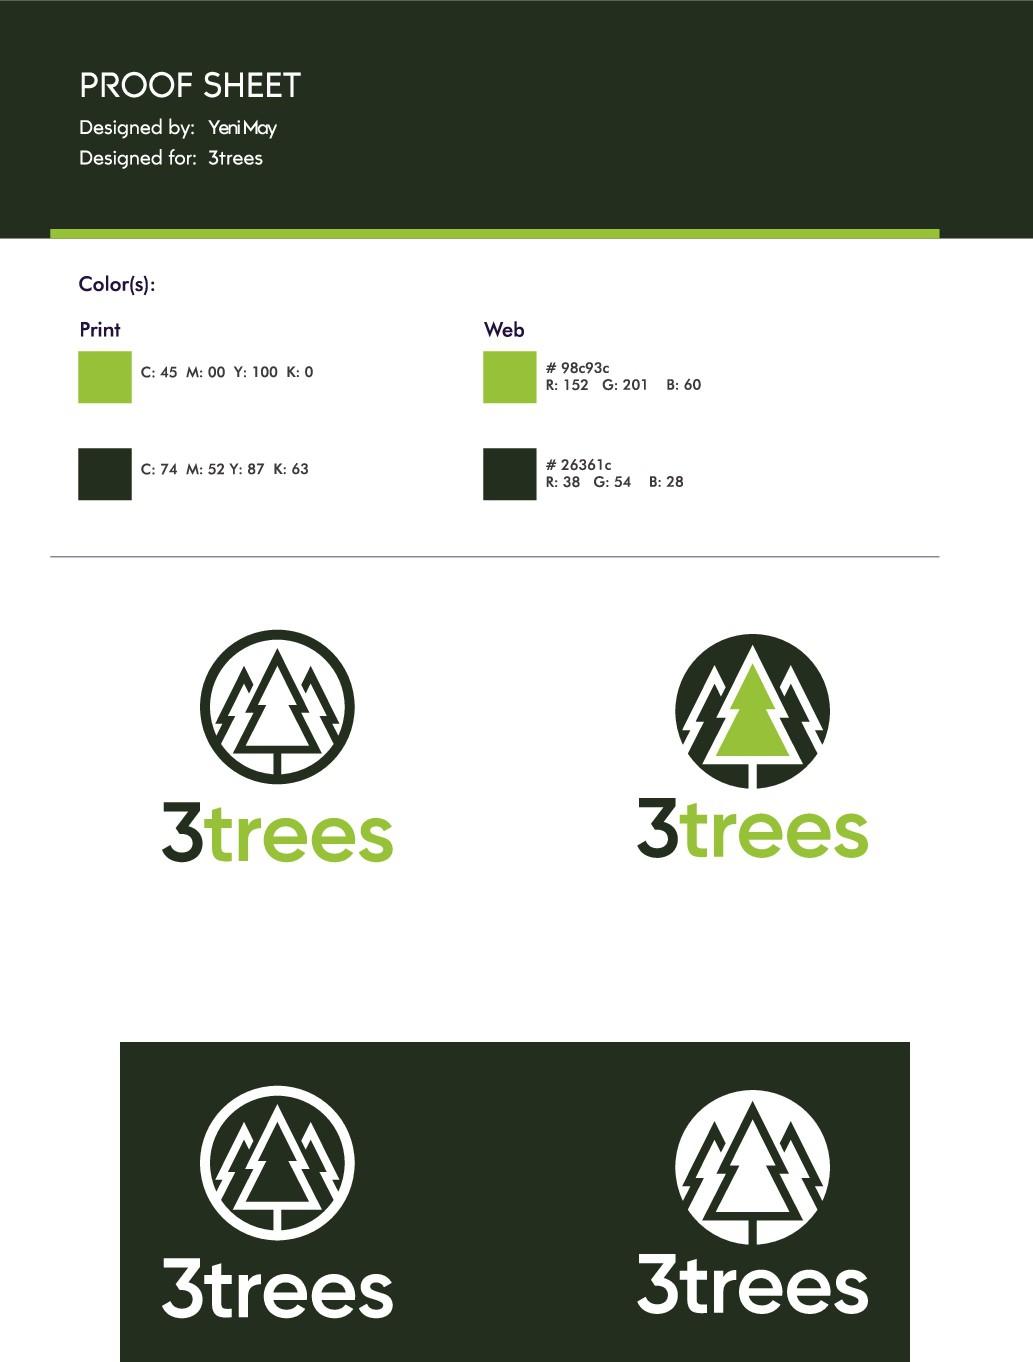 Start Up Tree Planting Non-Profit Needs a Logo